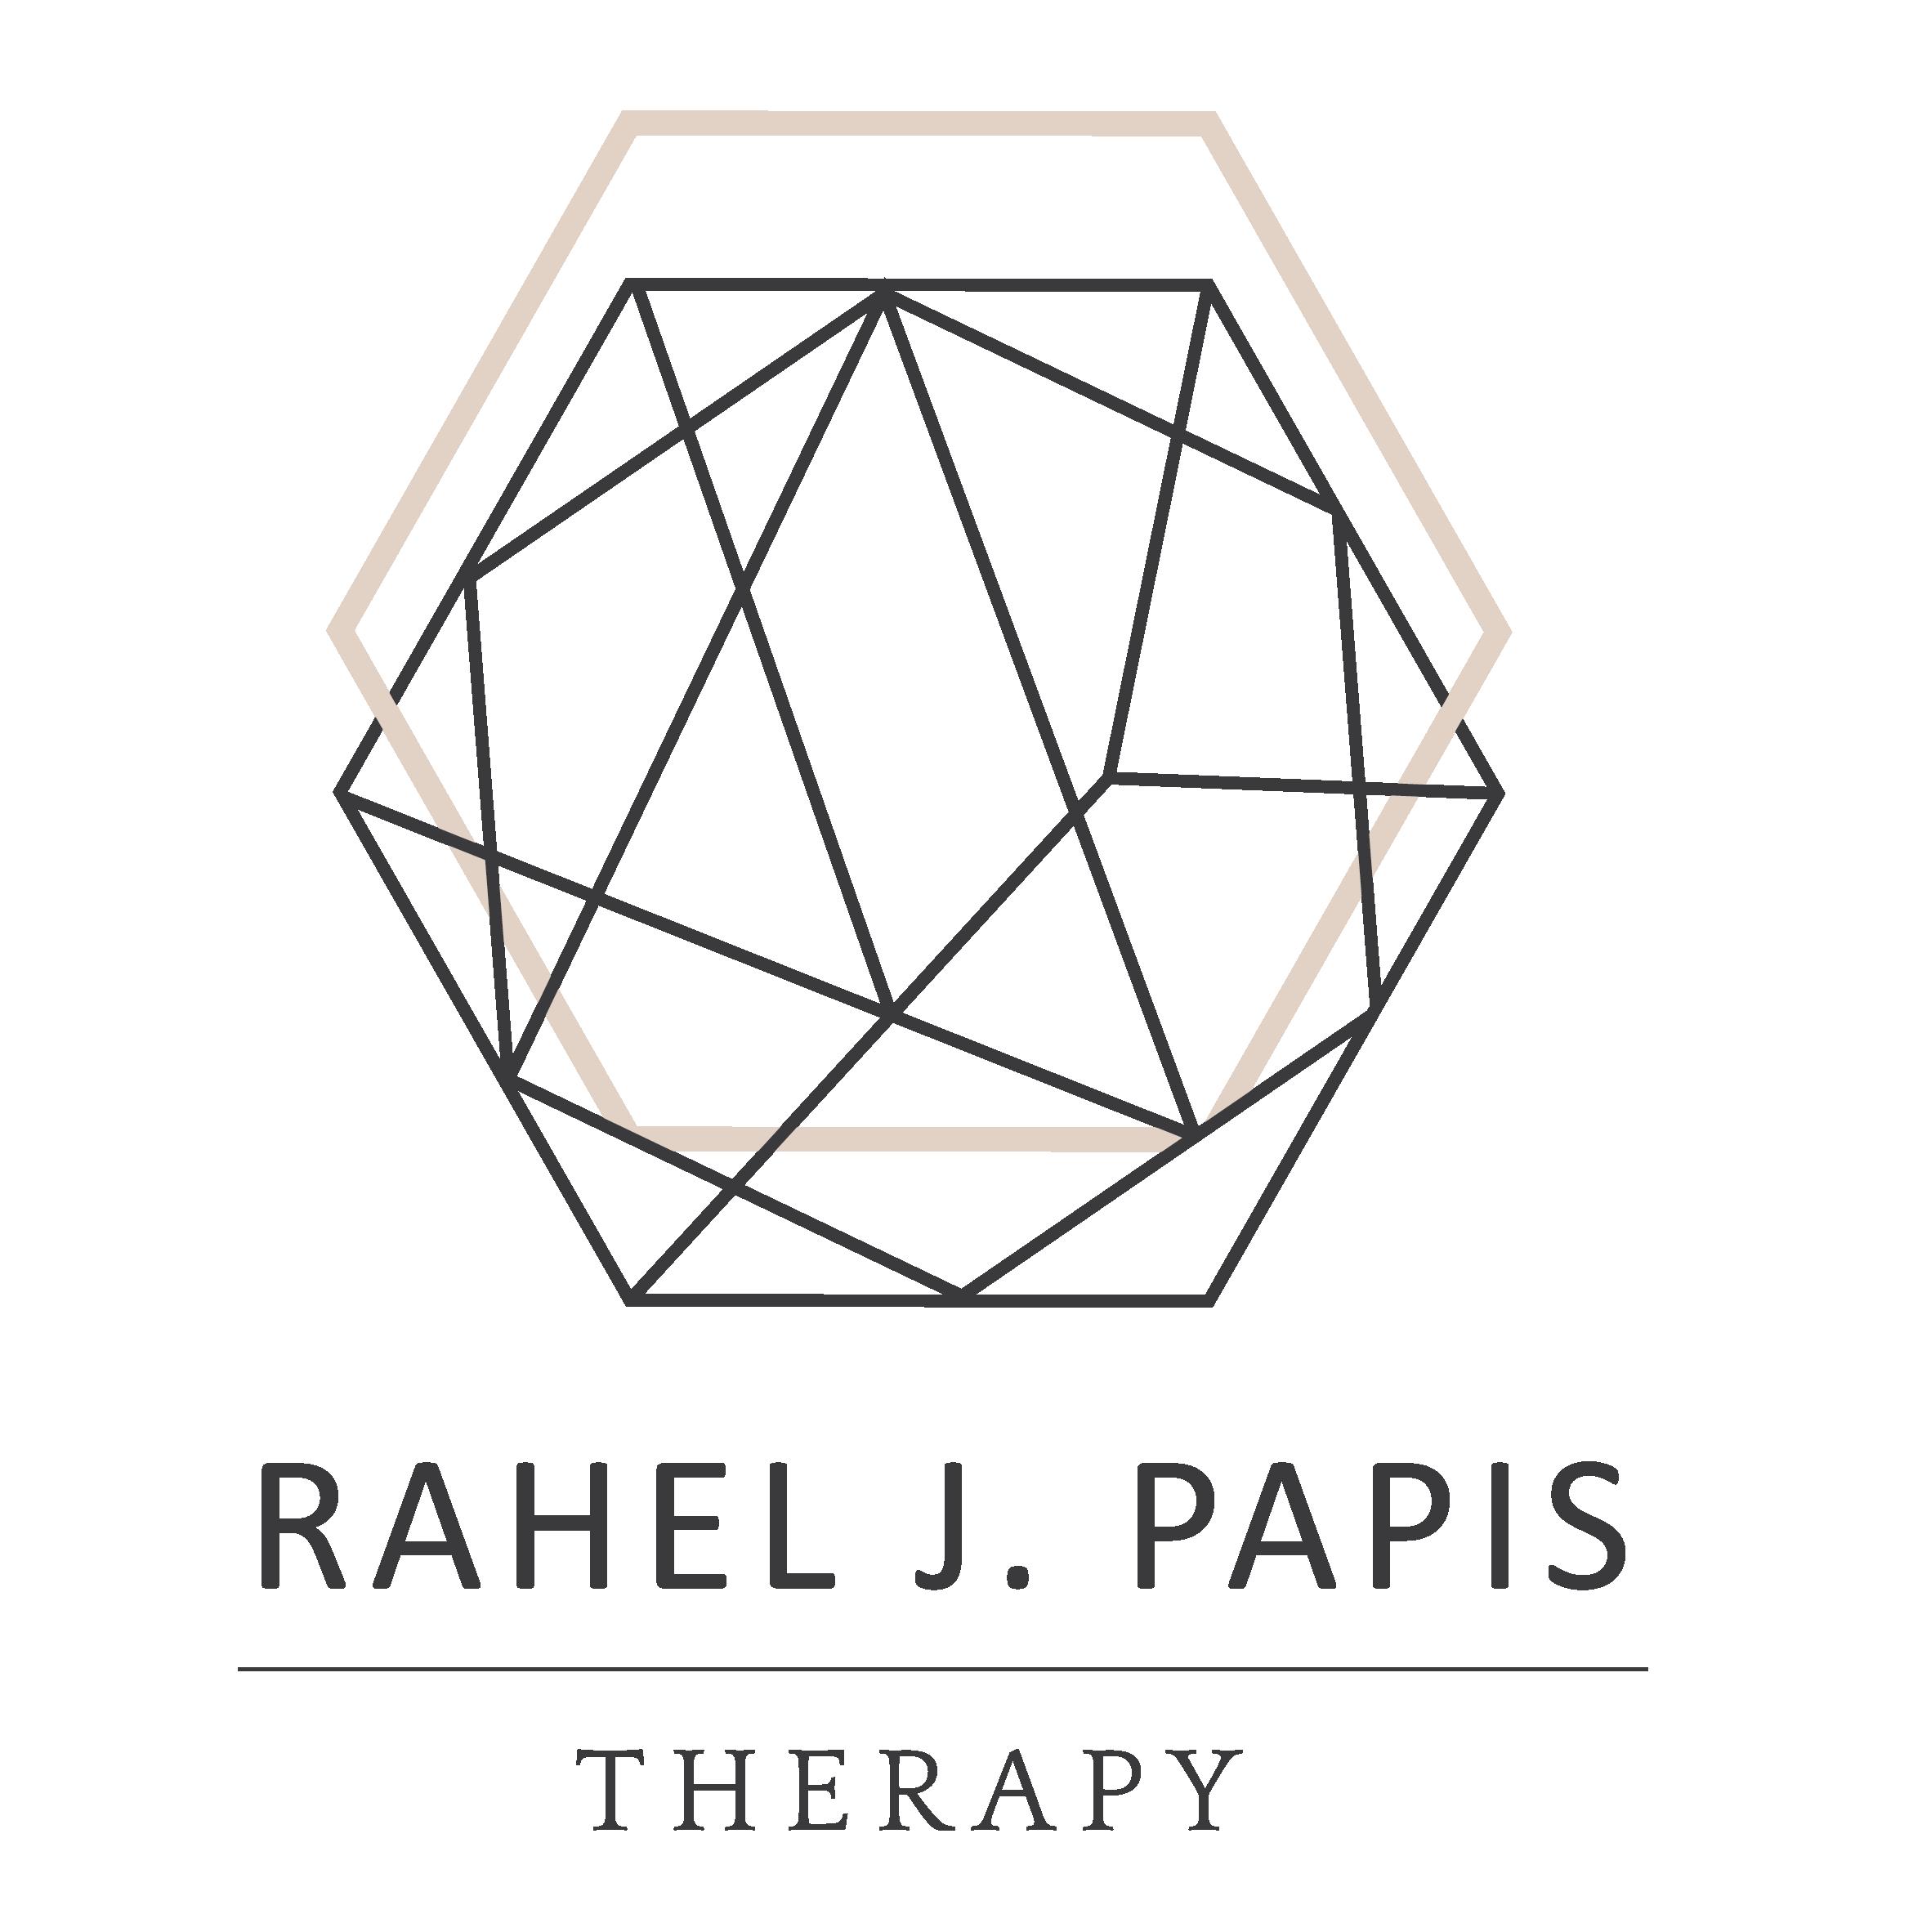 Rahel J. Papis Therapy